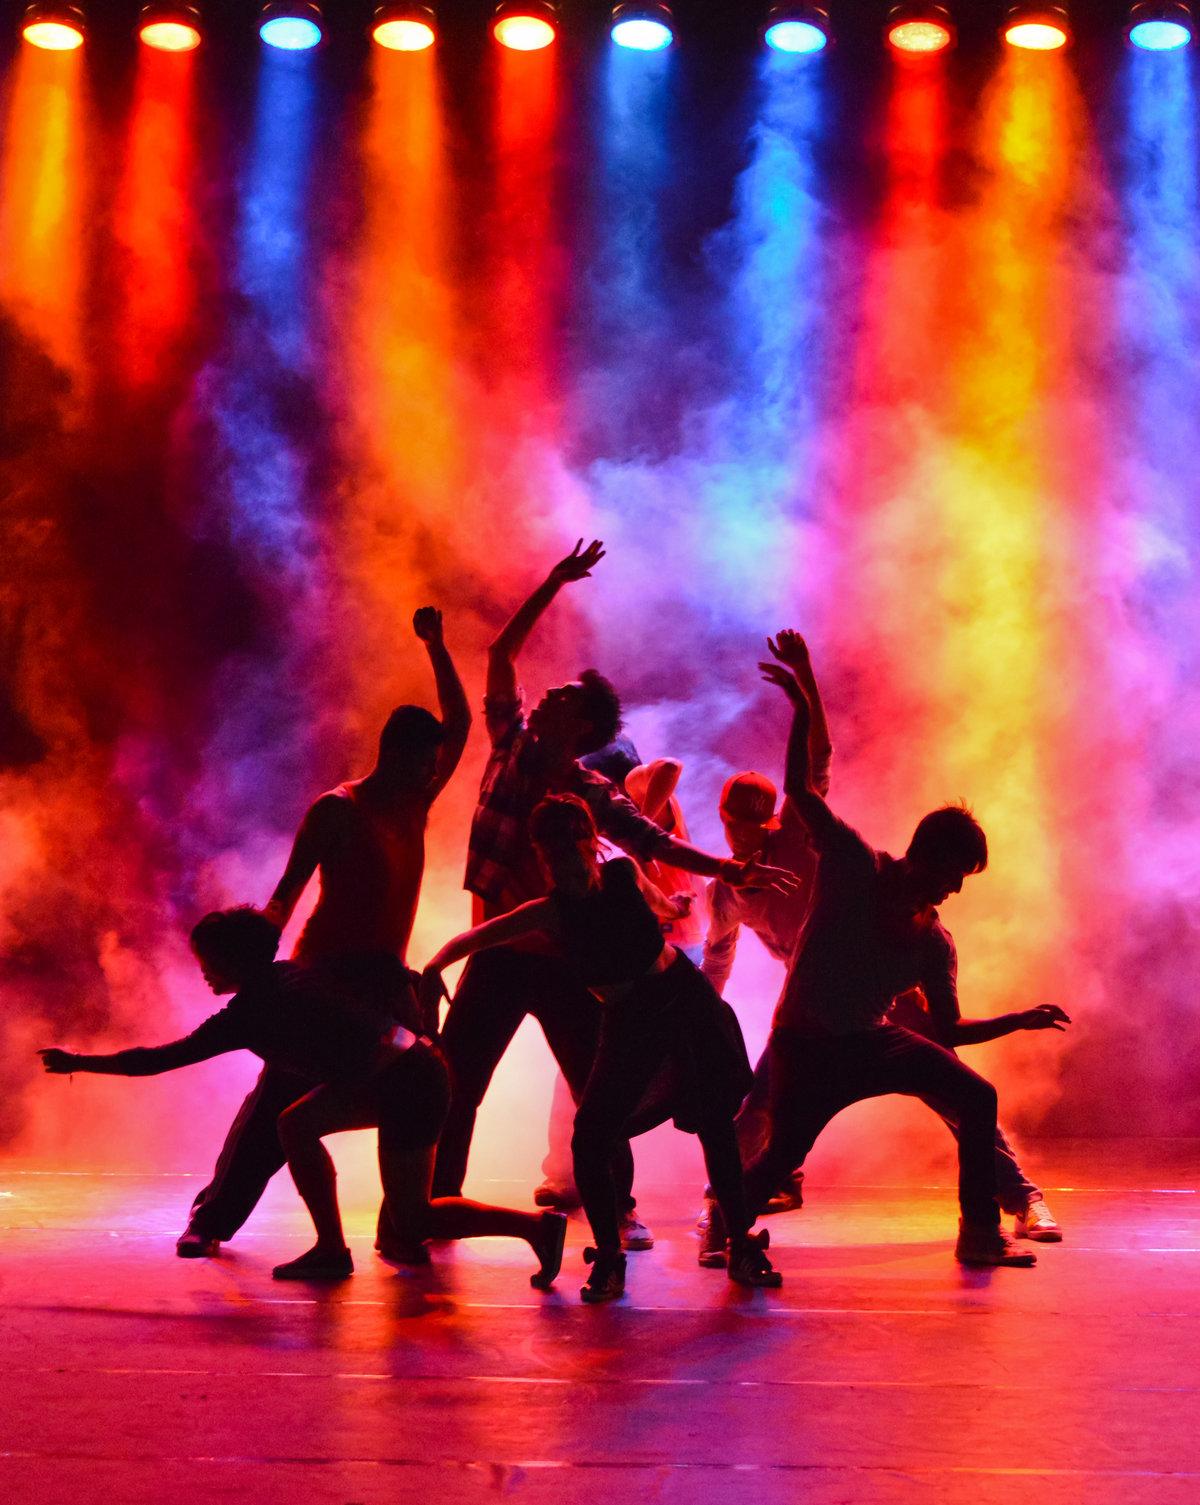 Картинка с танцем